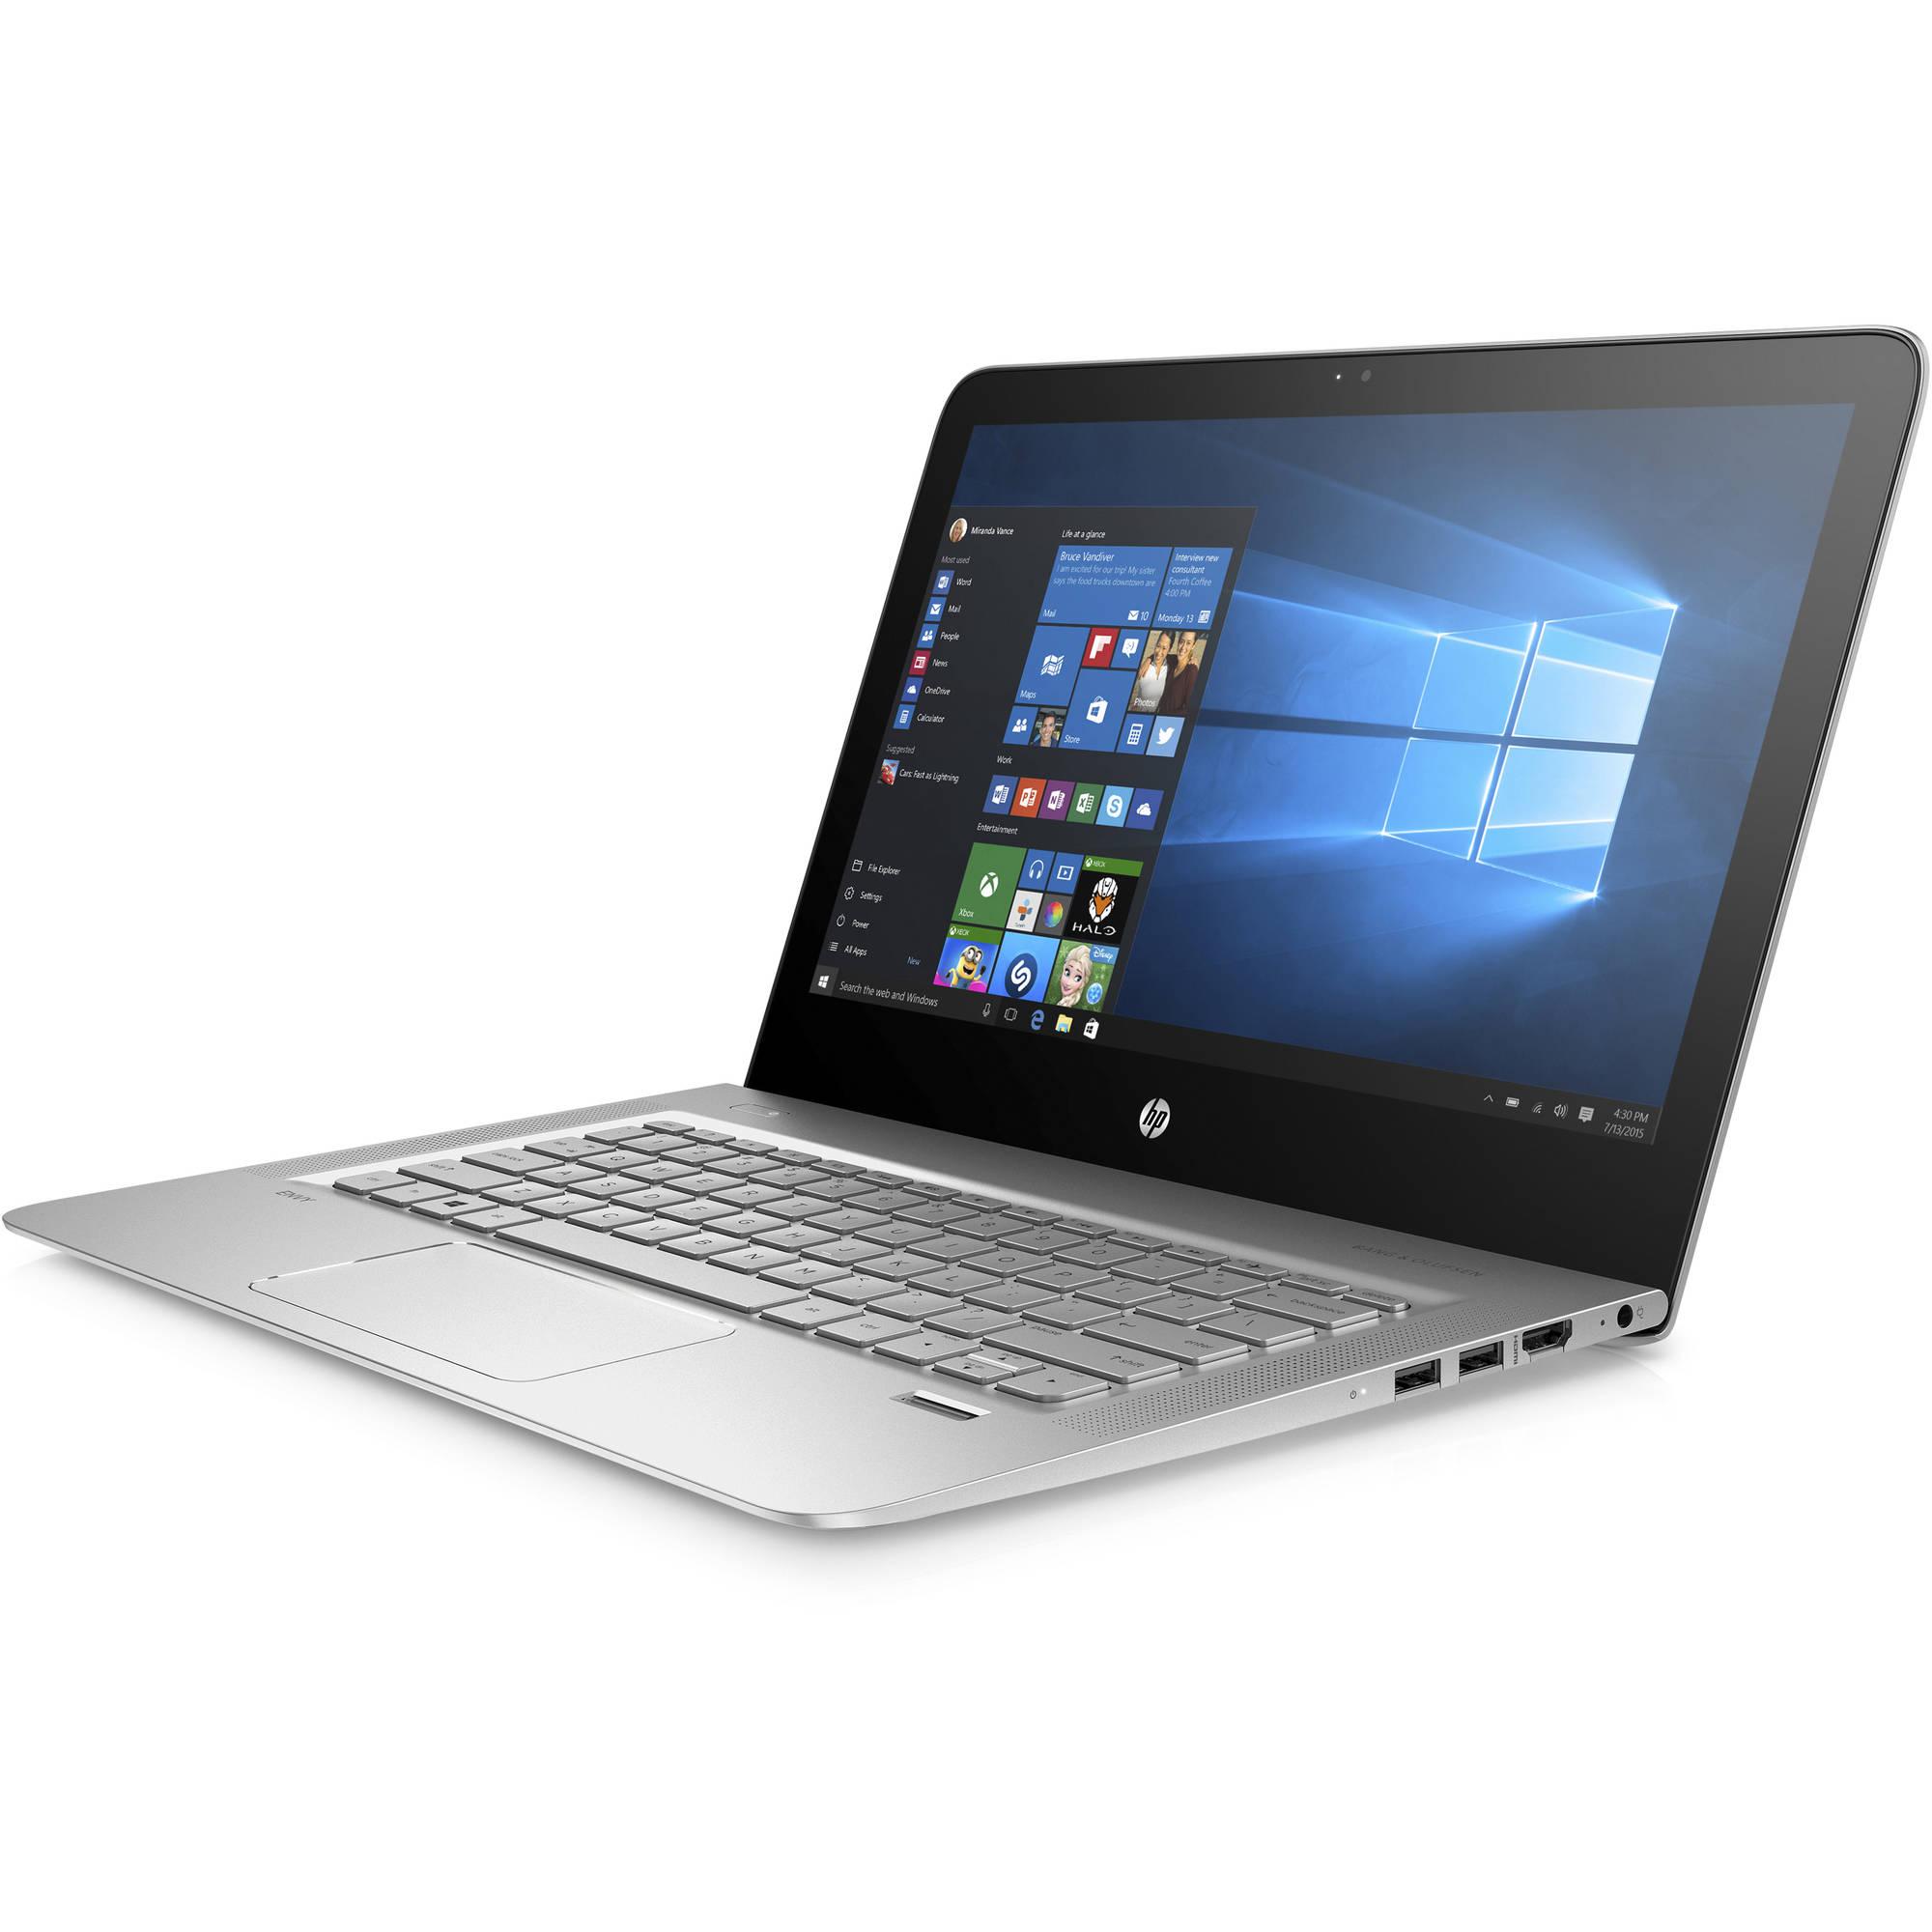 "HP Envy 13-d040wm 13.3"" Laptop, Quad HD+, Intel i7-6500U, 8GB RAM, 256GB SSD B&M Walmart YMMV $450"